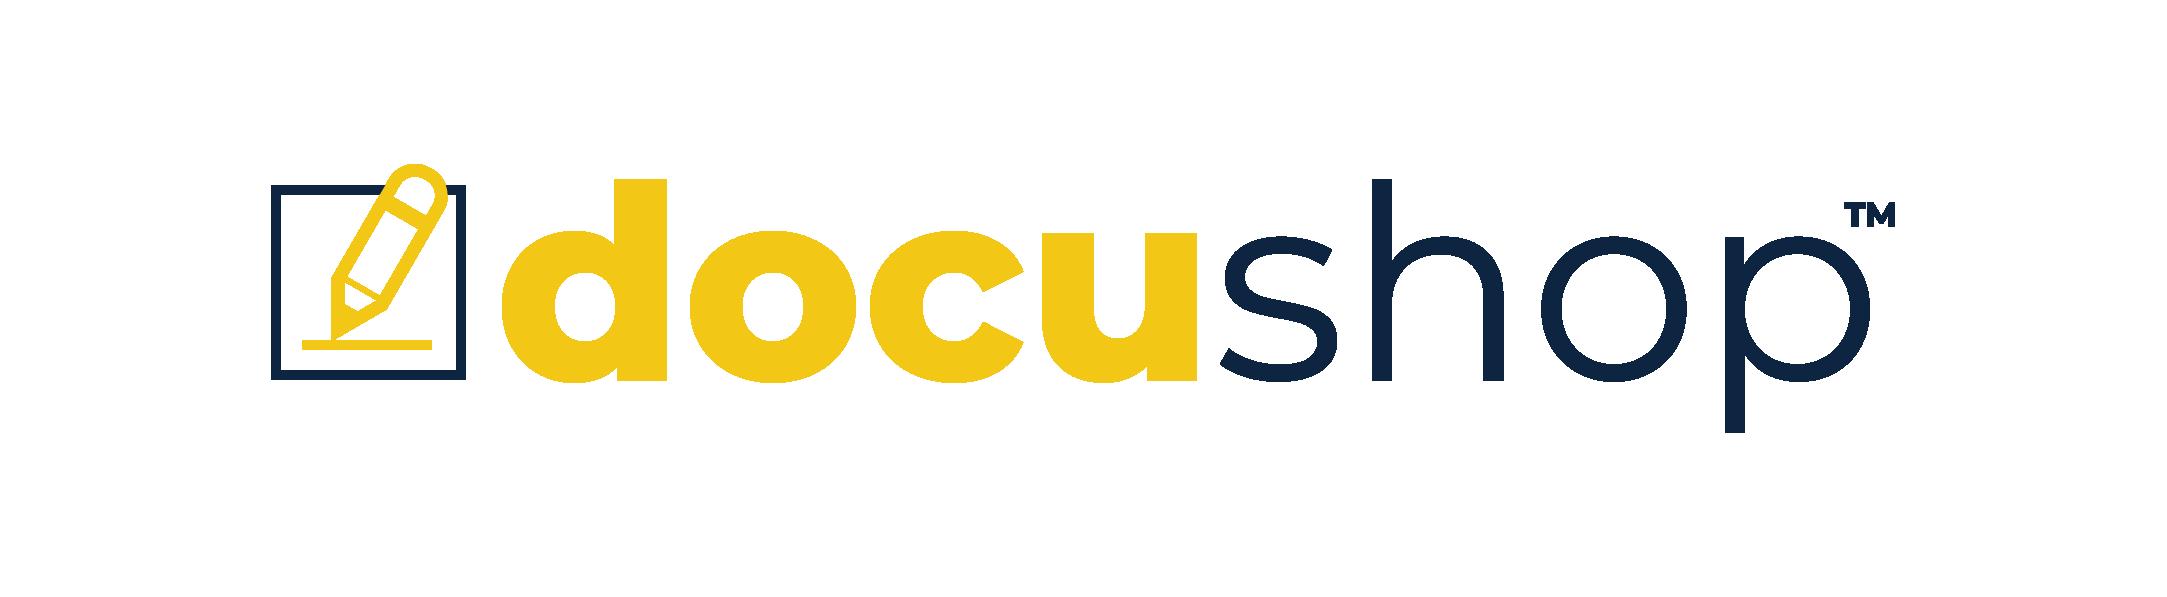 docushop logo